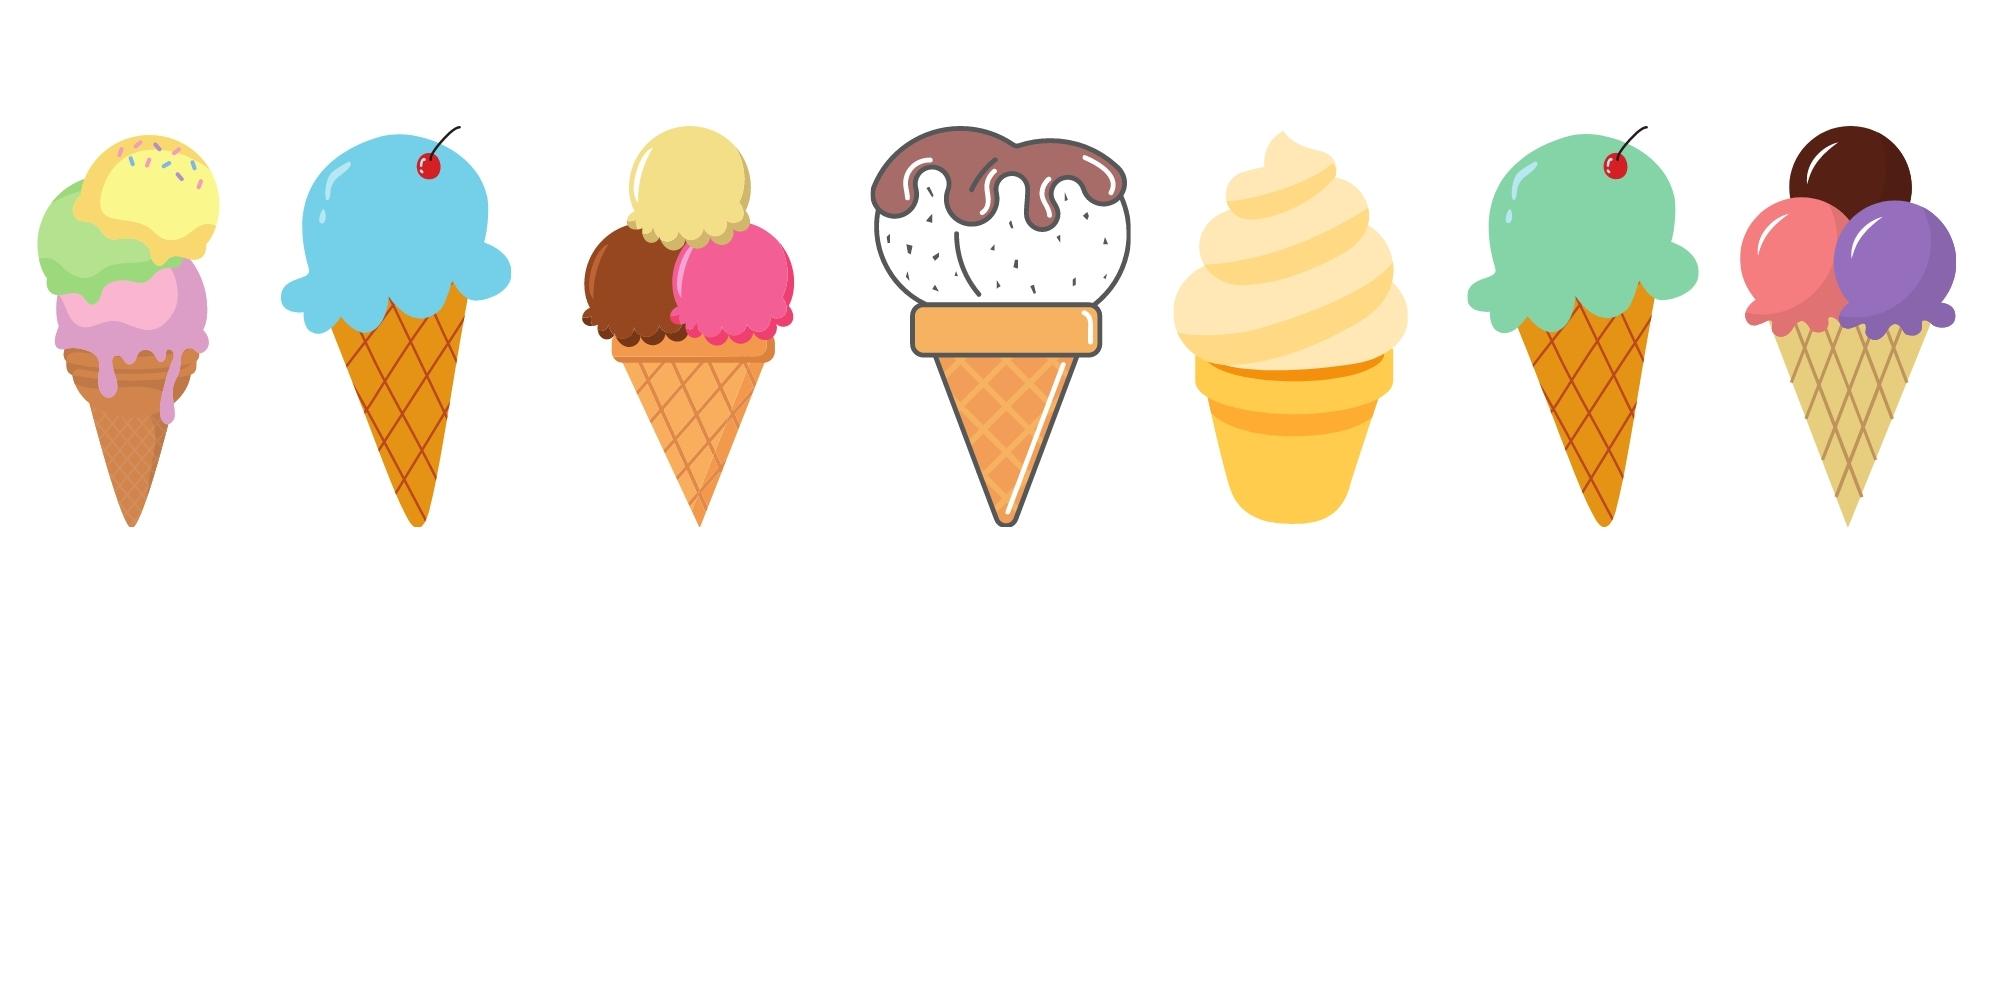 FULL Grab & Go Activity Kit: Ice Cream Craft (For Children Ages 2-5)